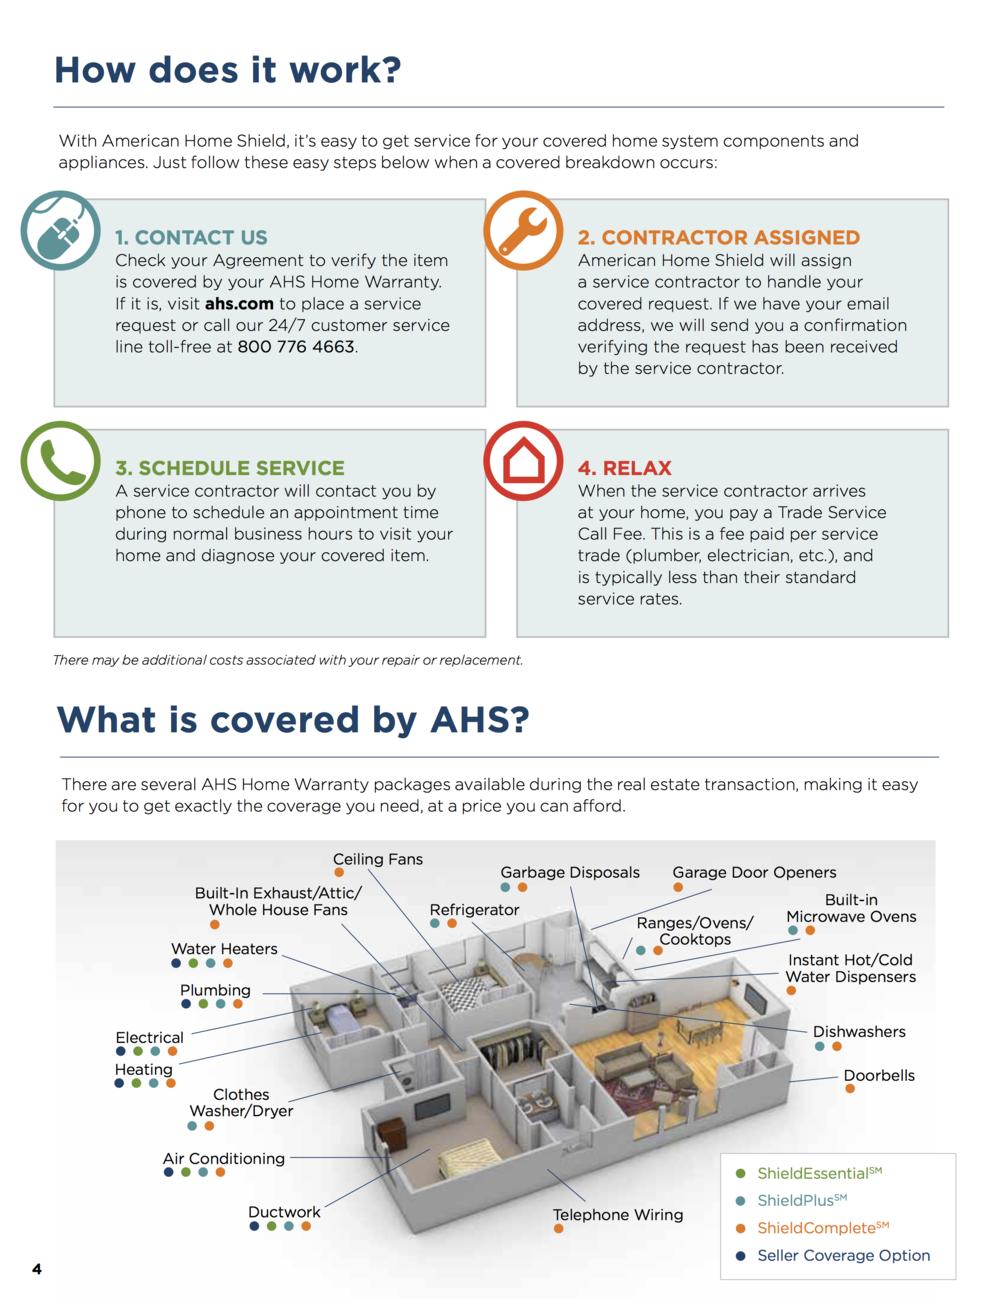 2017 AHS home warranty plans - real estate 4.png